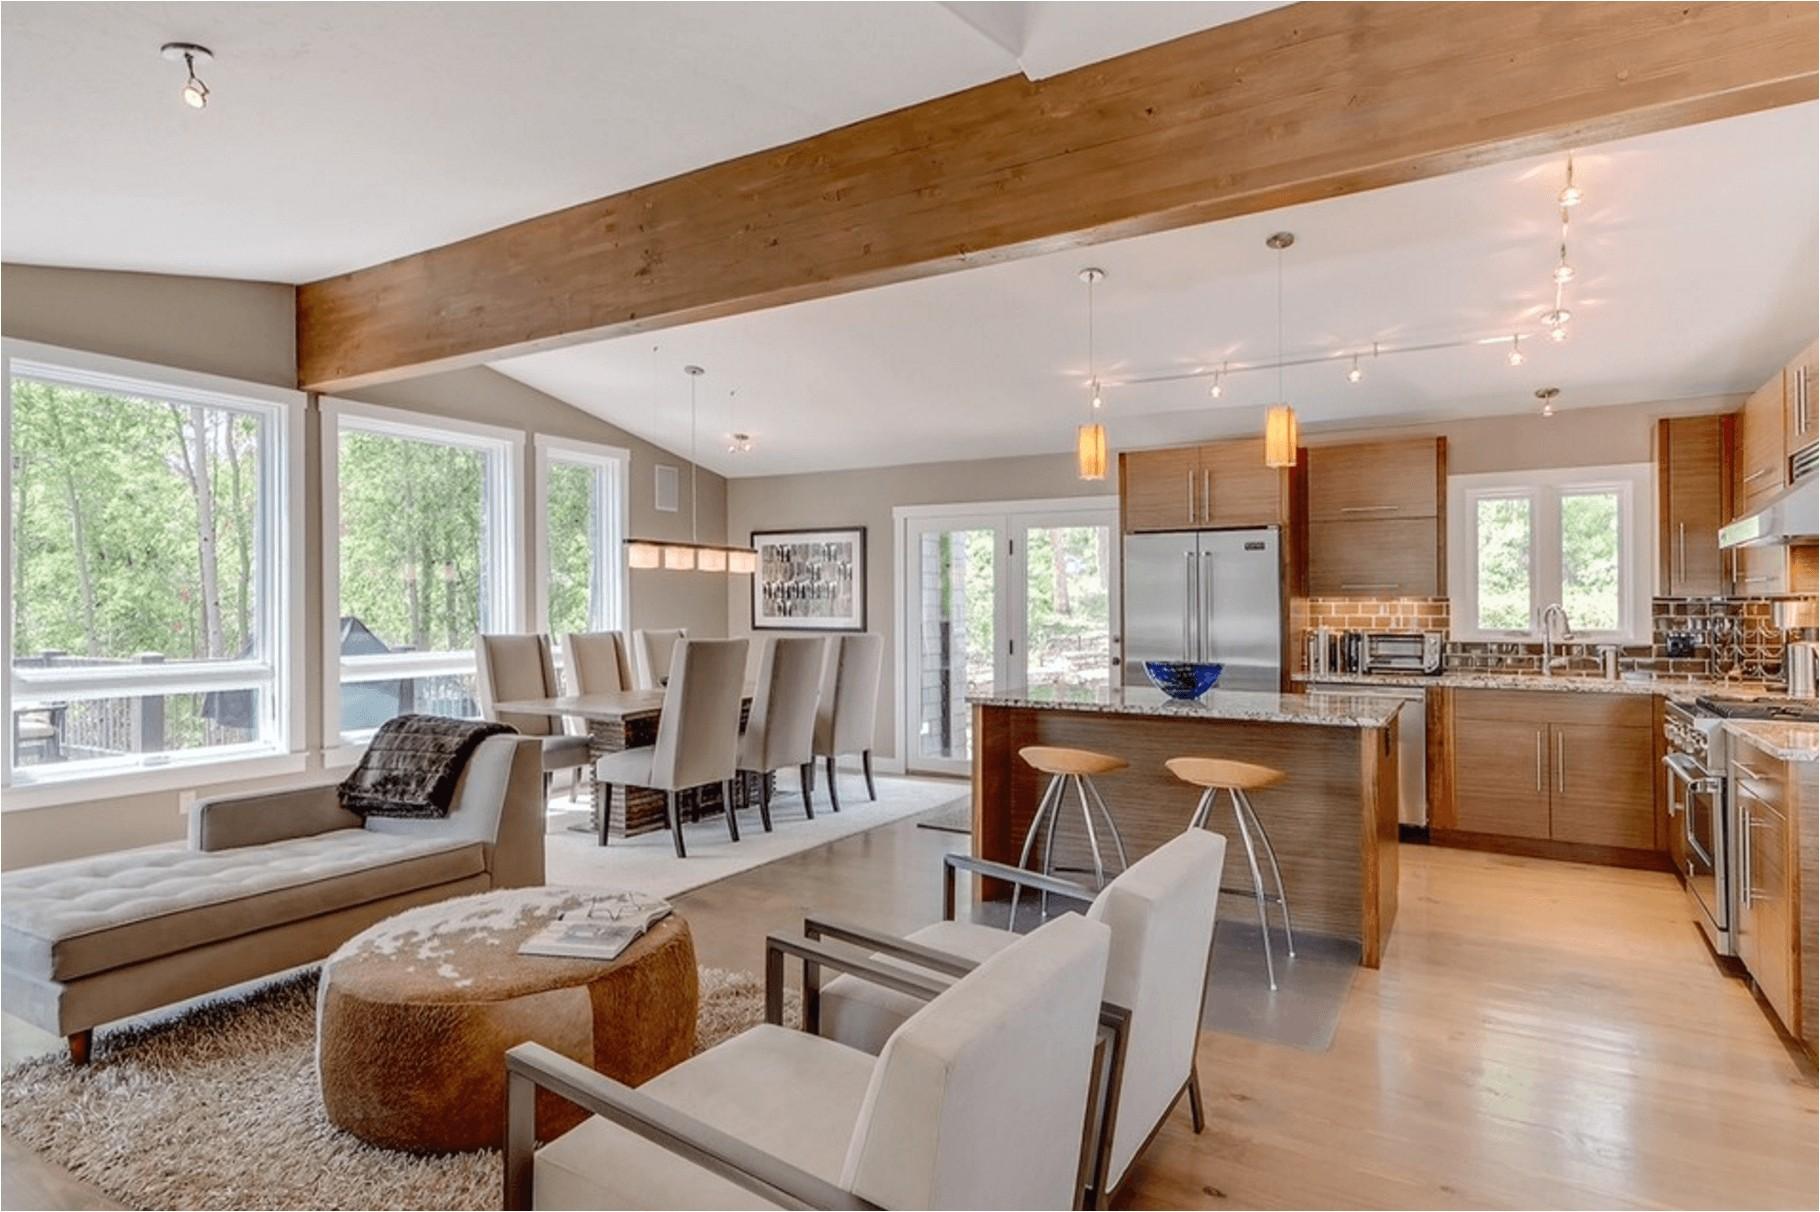 Pictures Of Open Floor Plan Homes Open Floor Plans A Trend for Modern Living